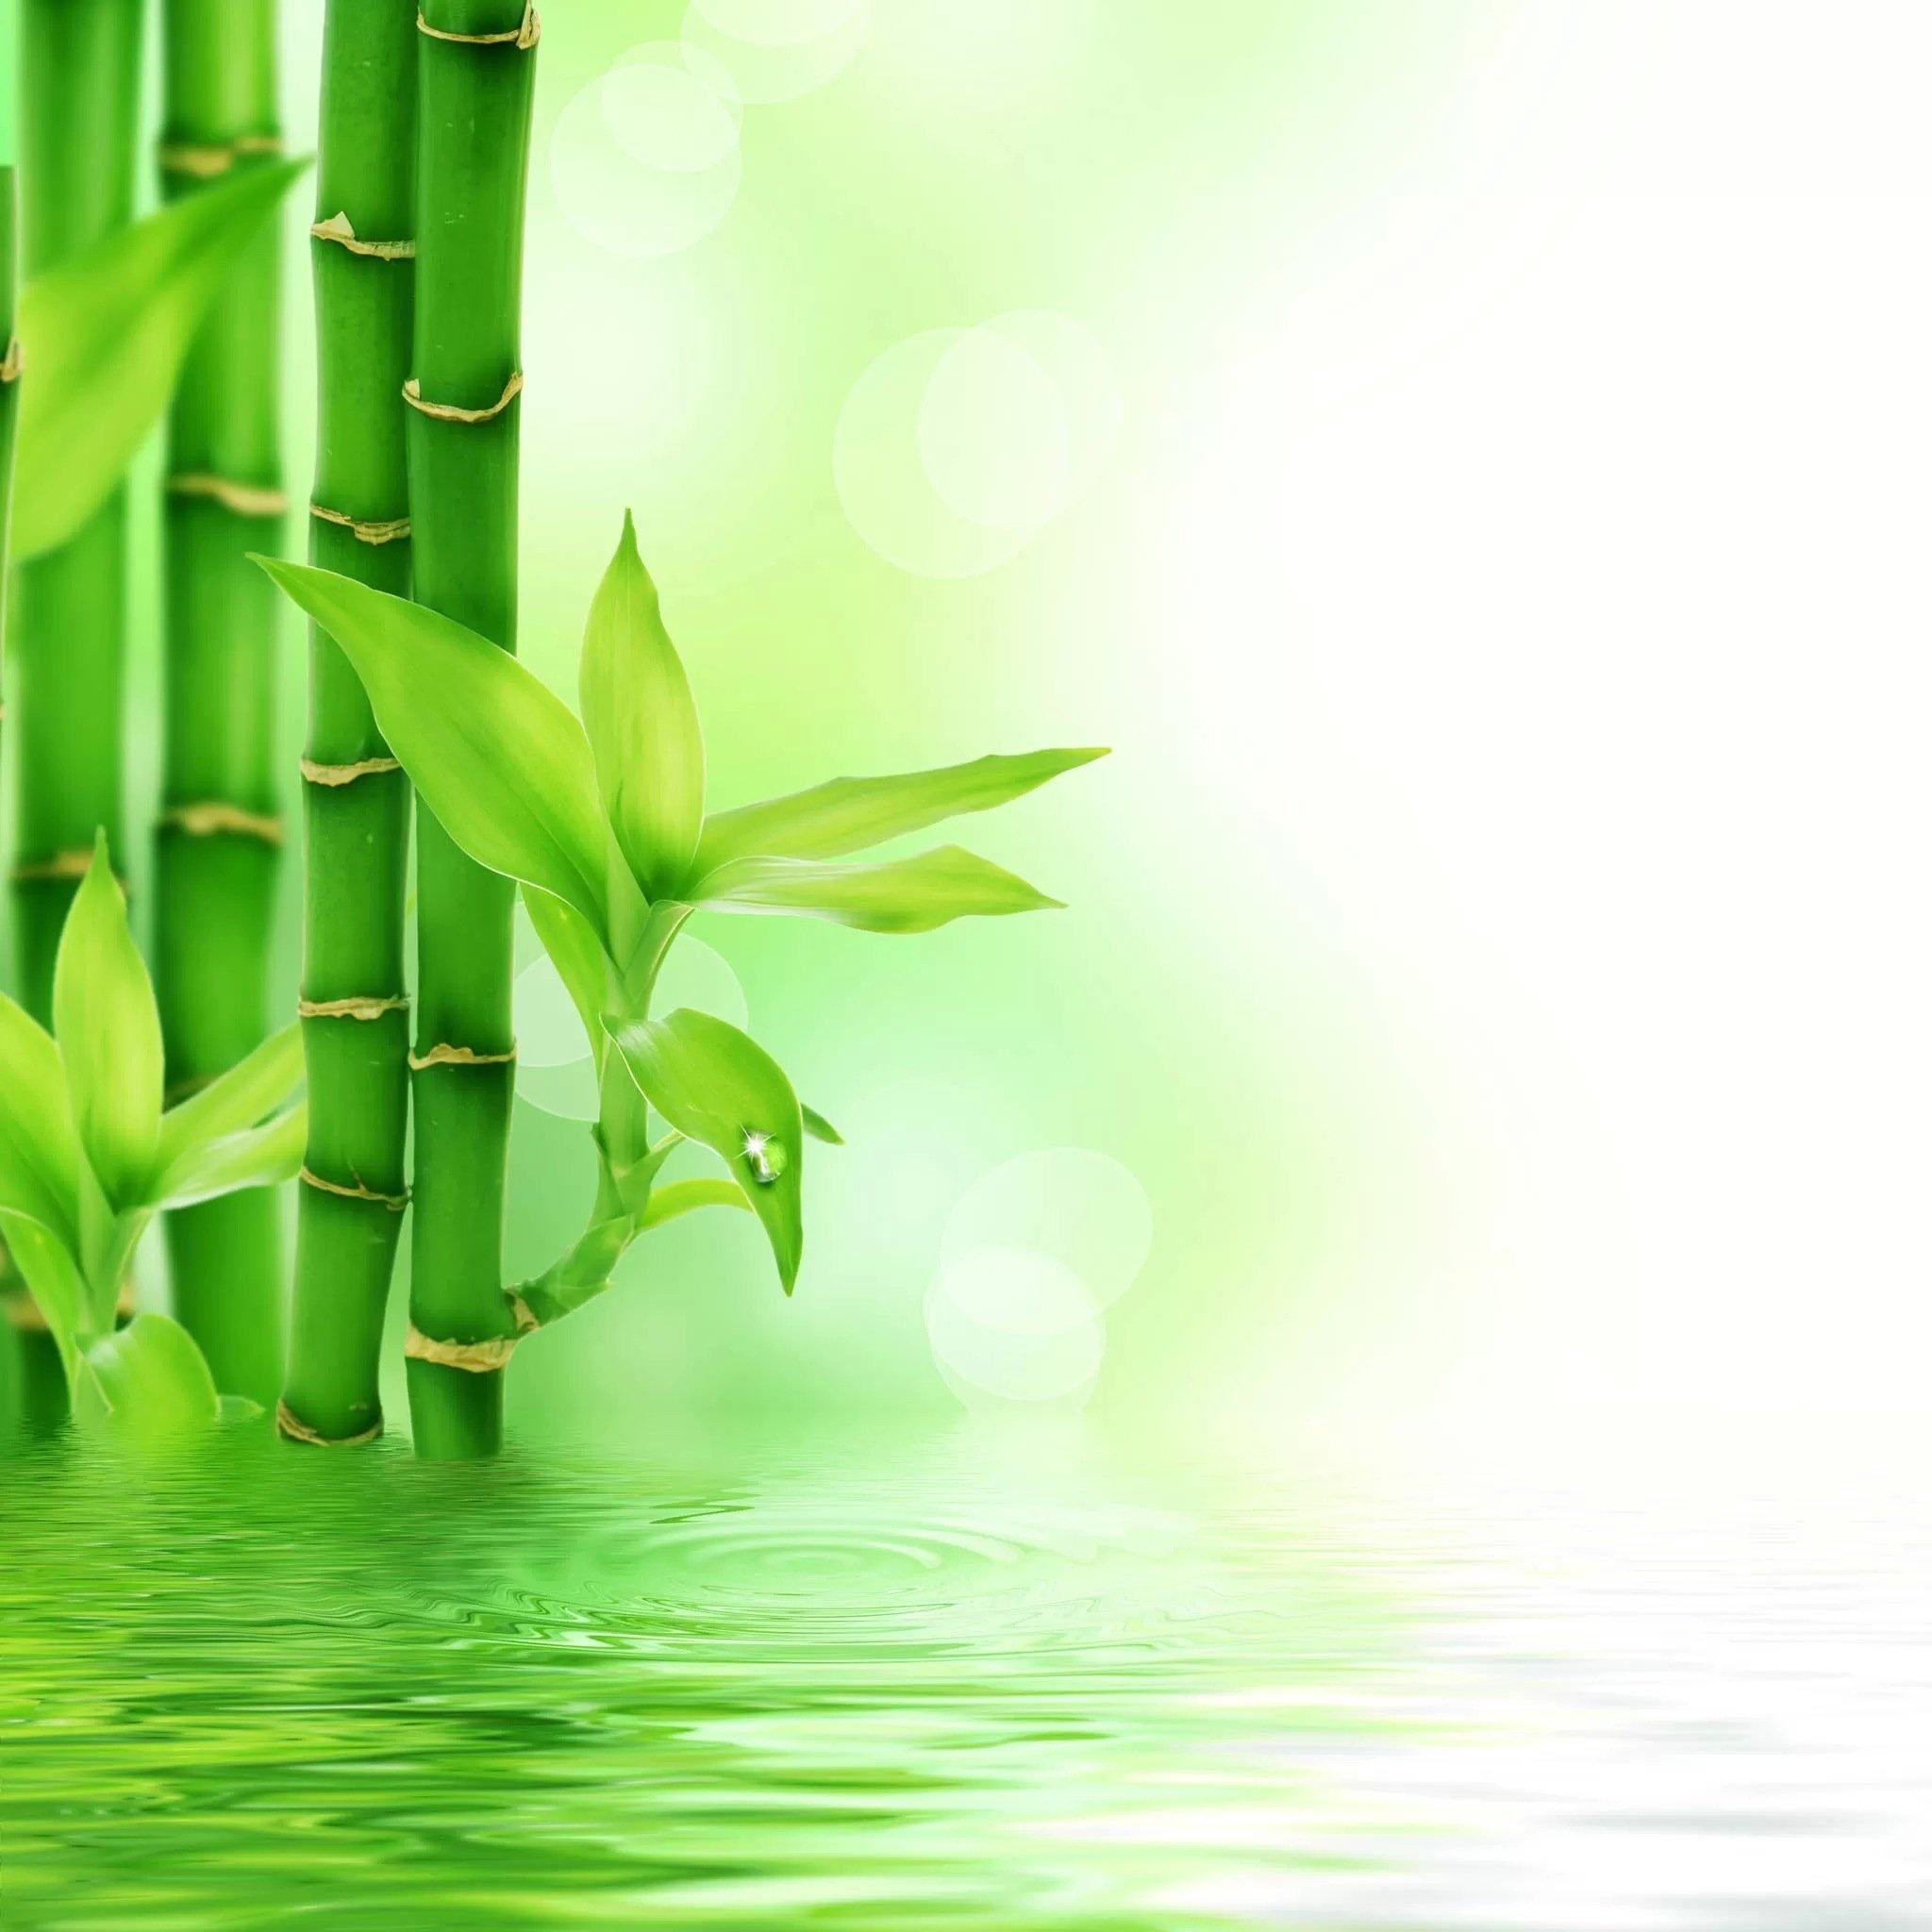 ipad风景绿色壁纸_ipad风景绿色壁纸下载